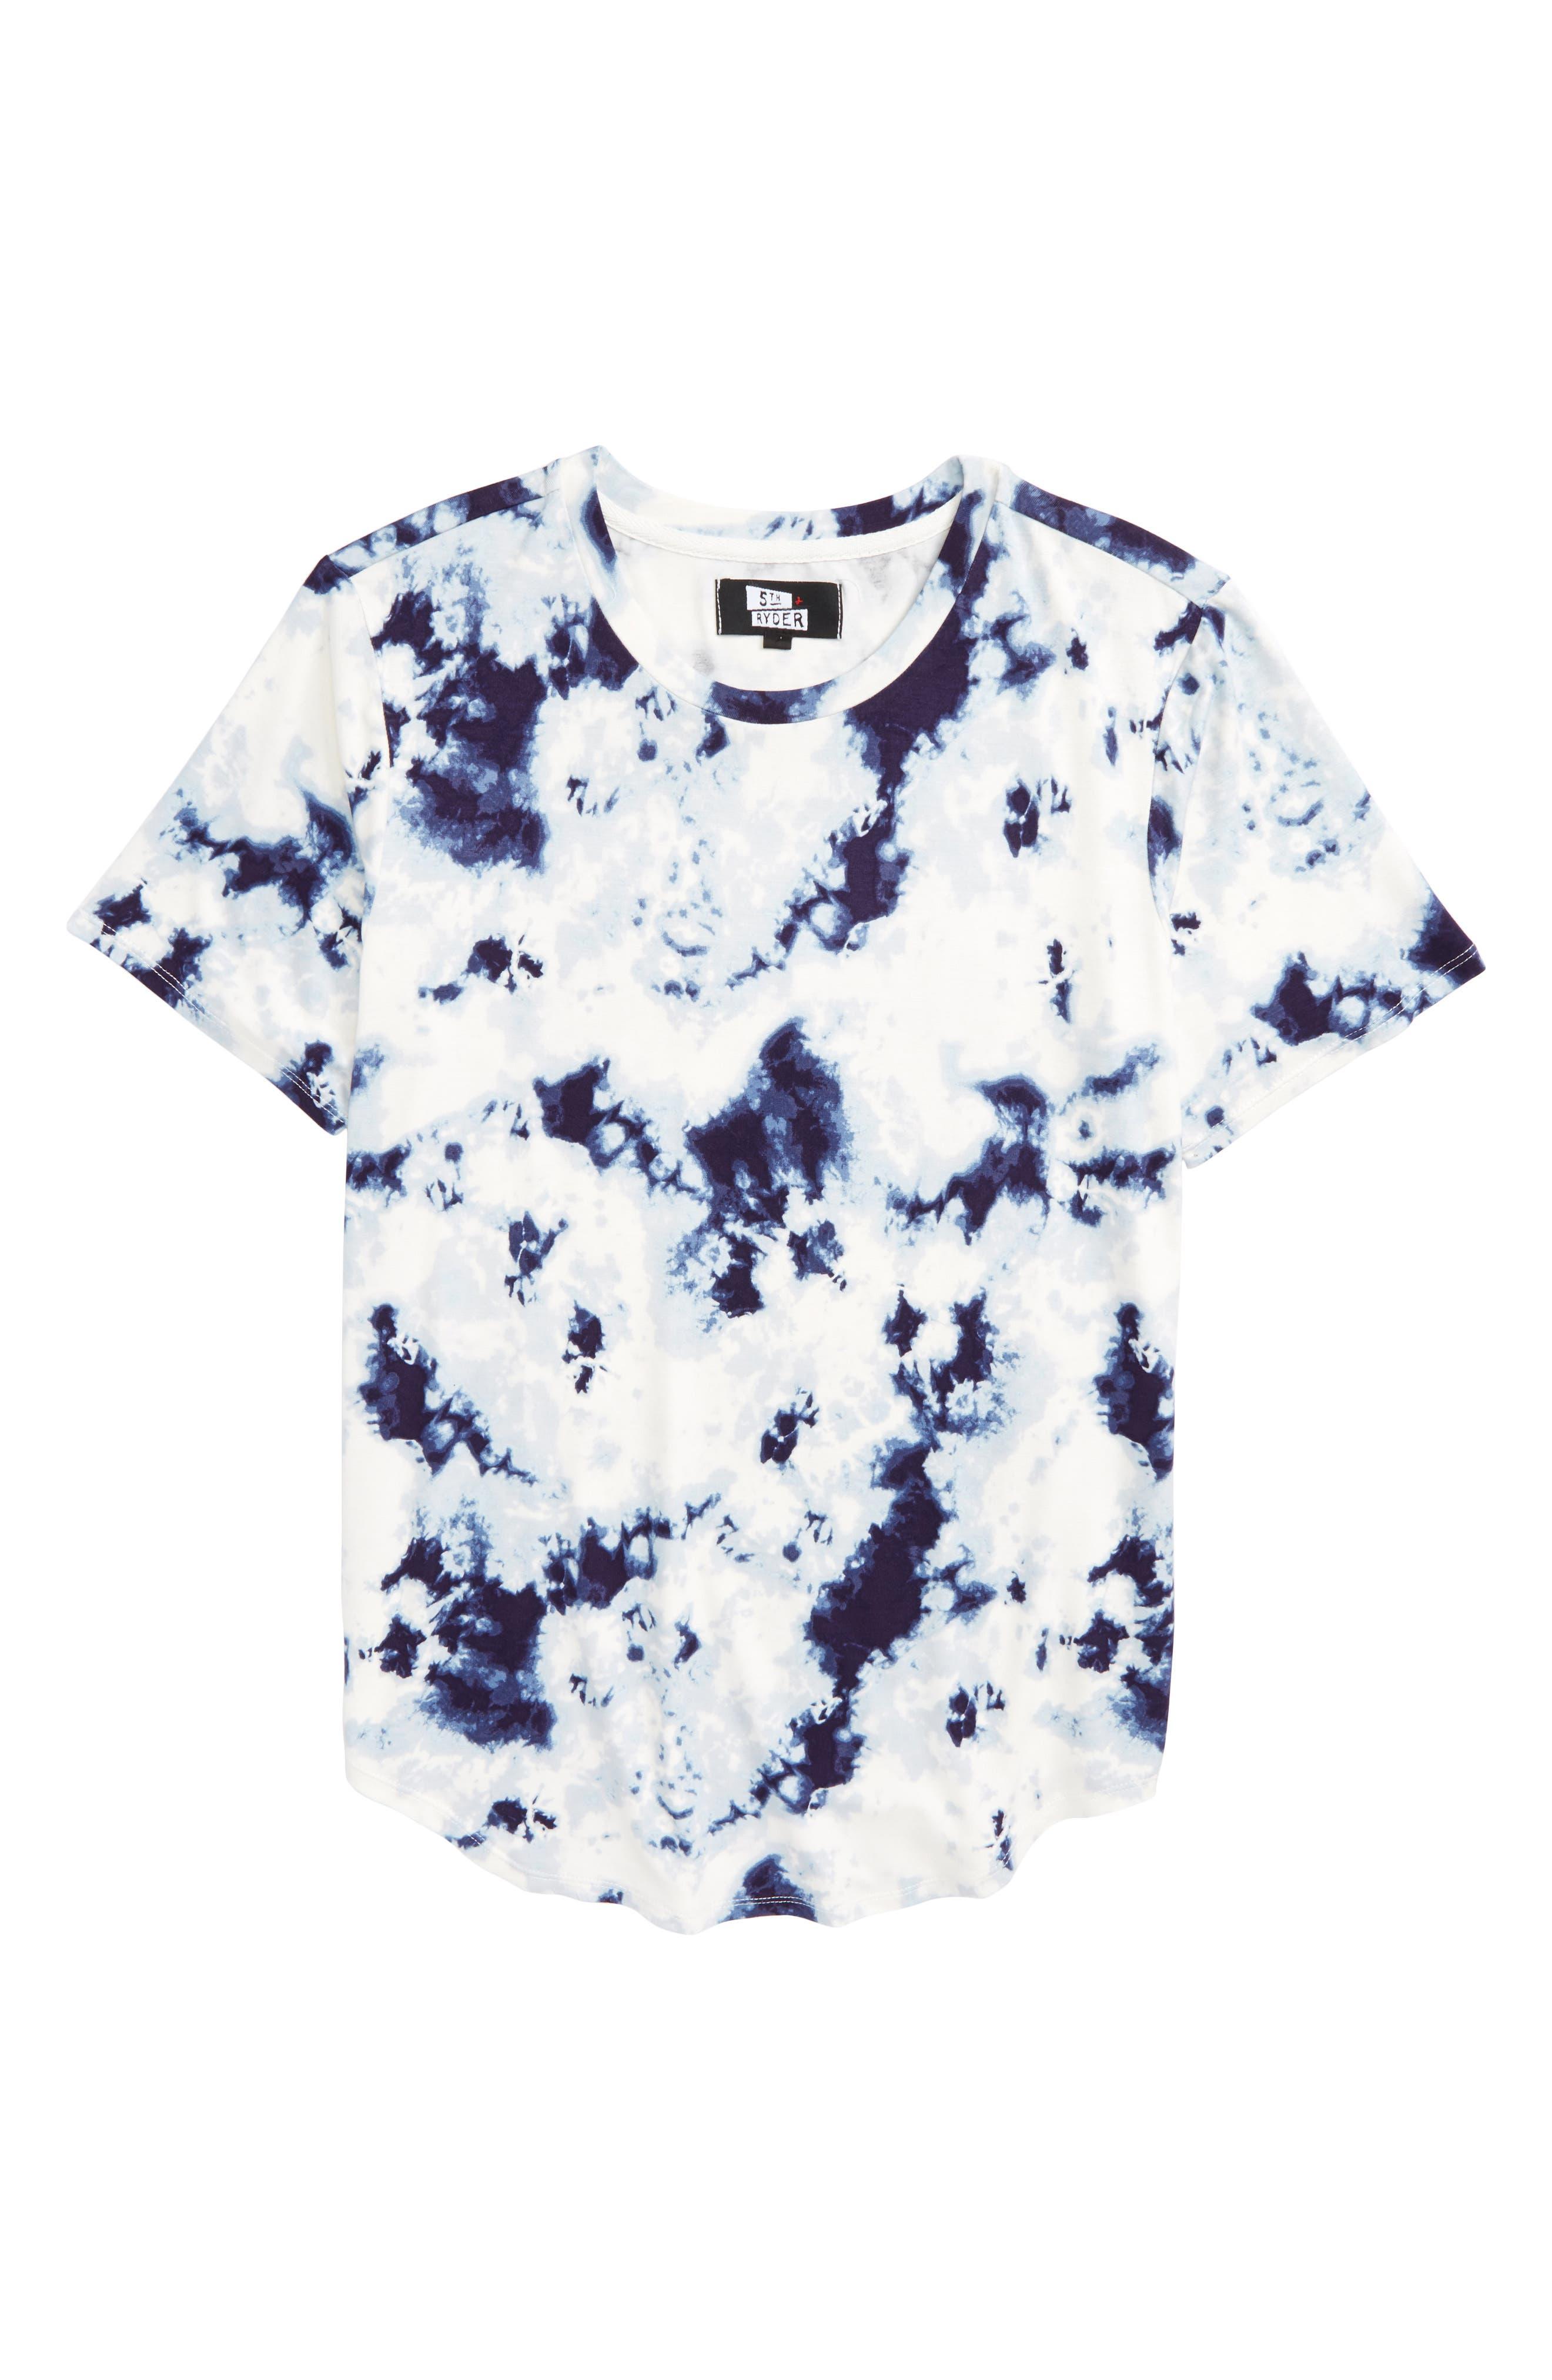 Main Image - 5th and Ryder Curved Hem T-Shirt (Big Boys)